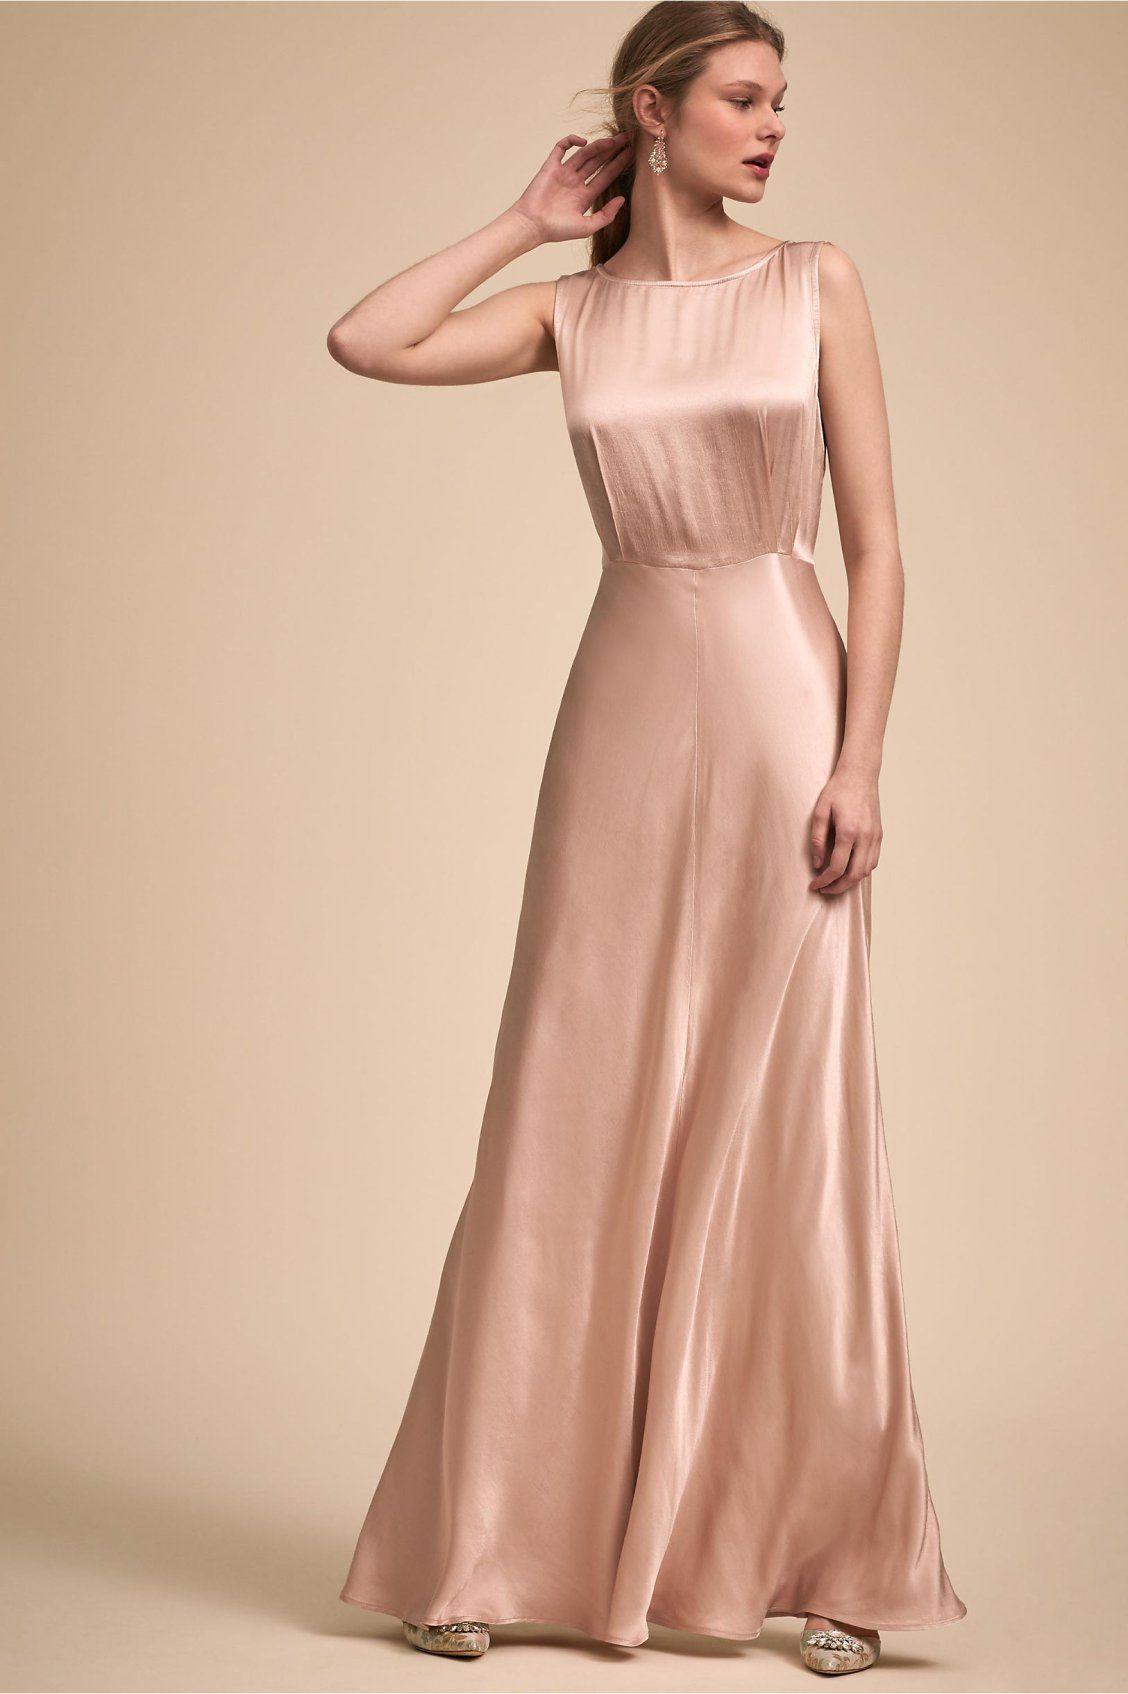 Ghost London Alexia Dress Bhldn Bridesmaid Dresses Pink